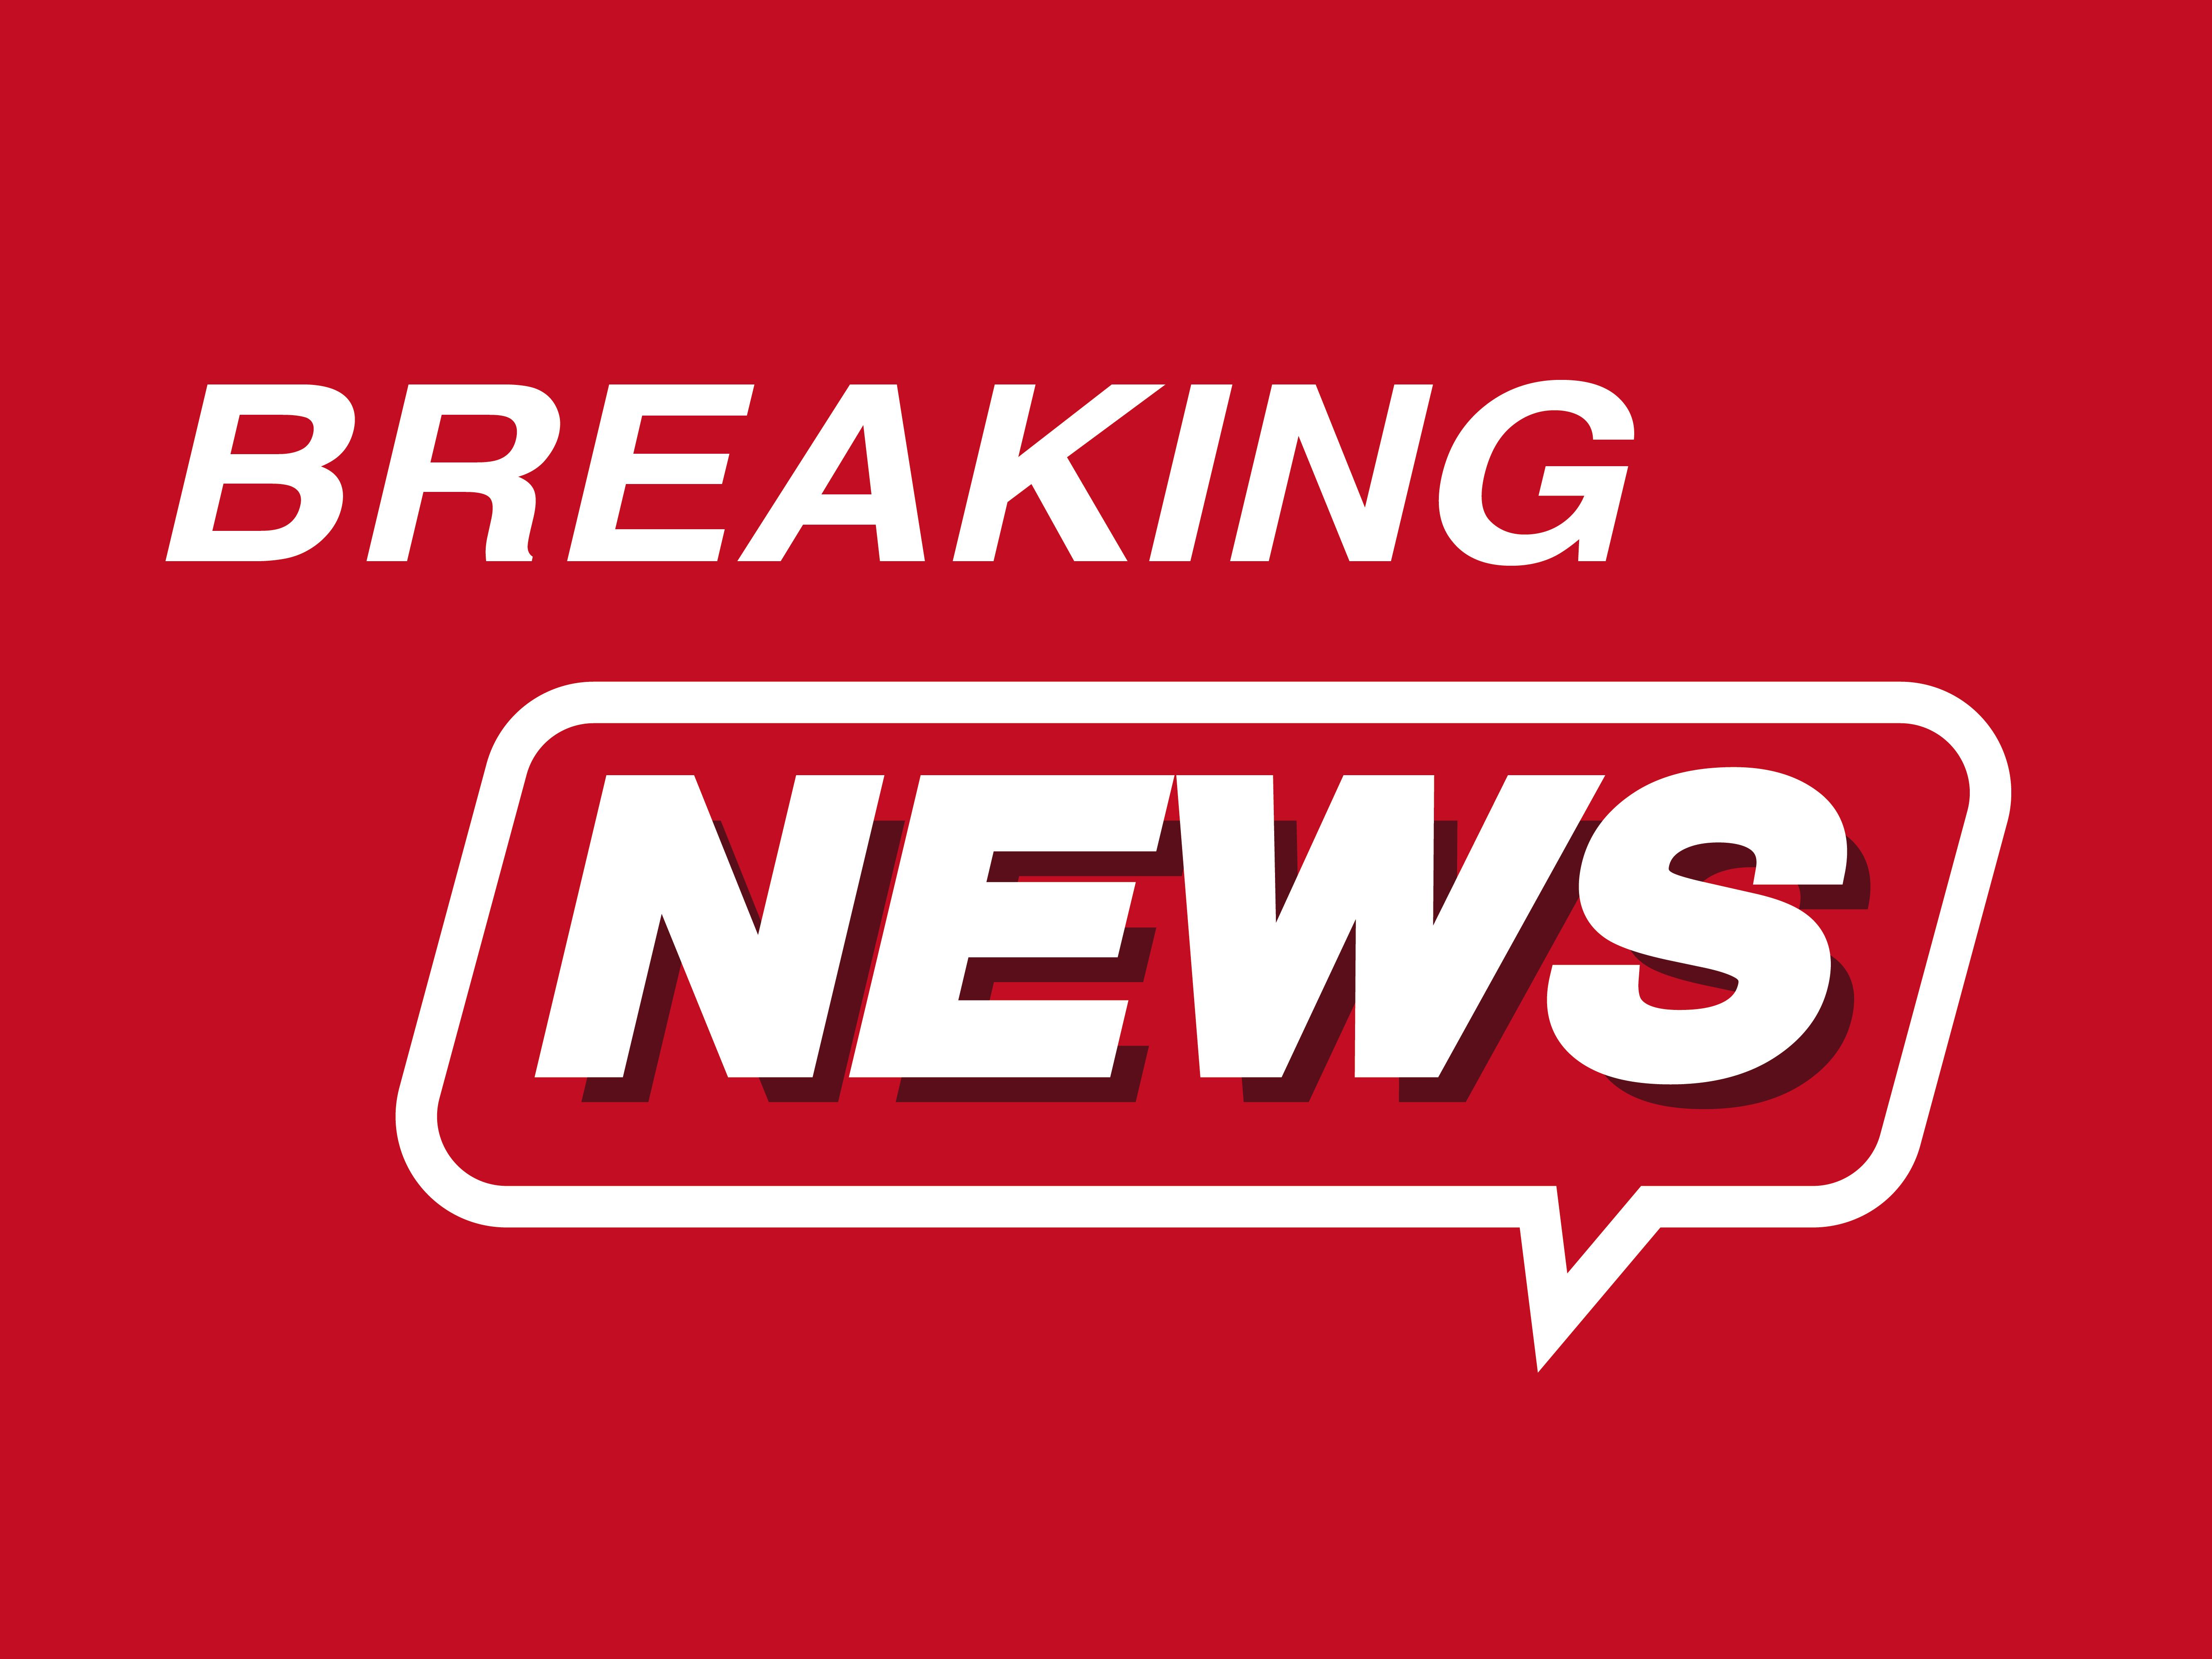 Sanders leads Buttigieg, Klobuchar at halfway point in New Hampshire: US media